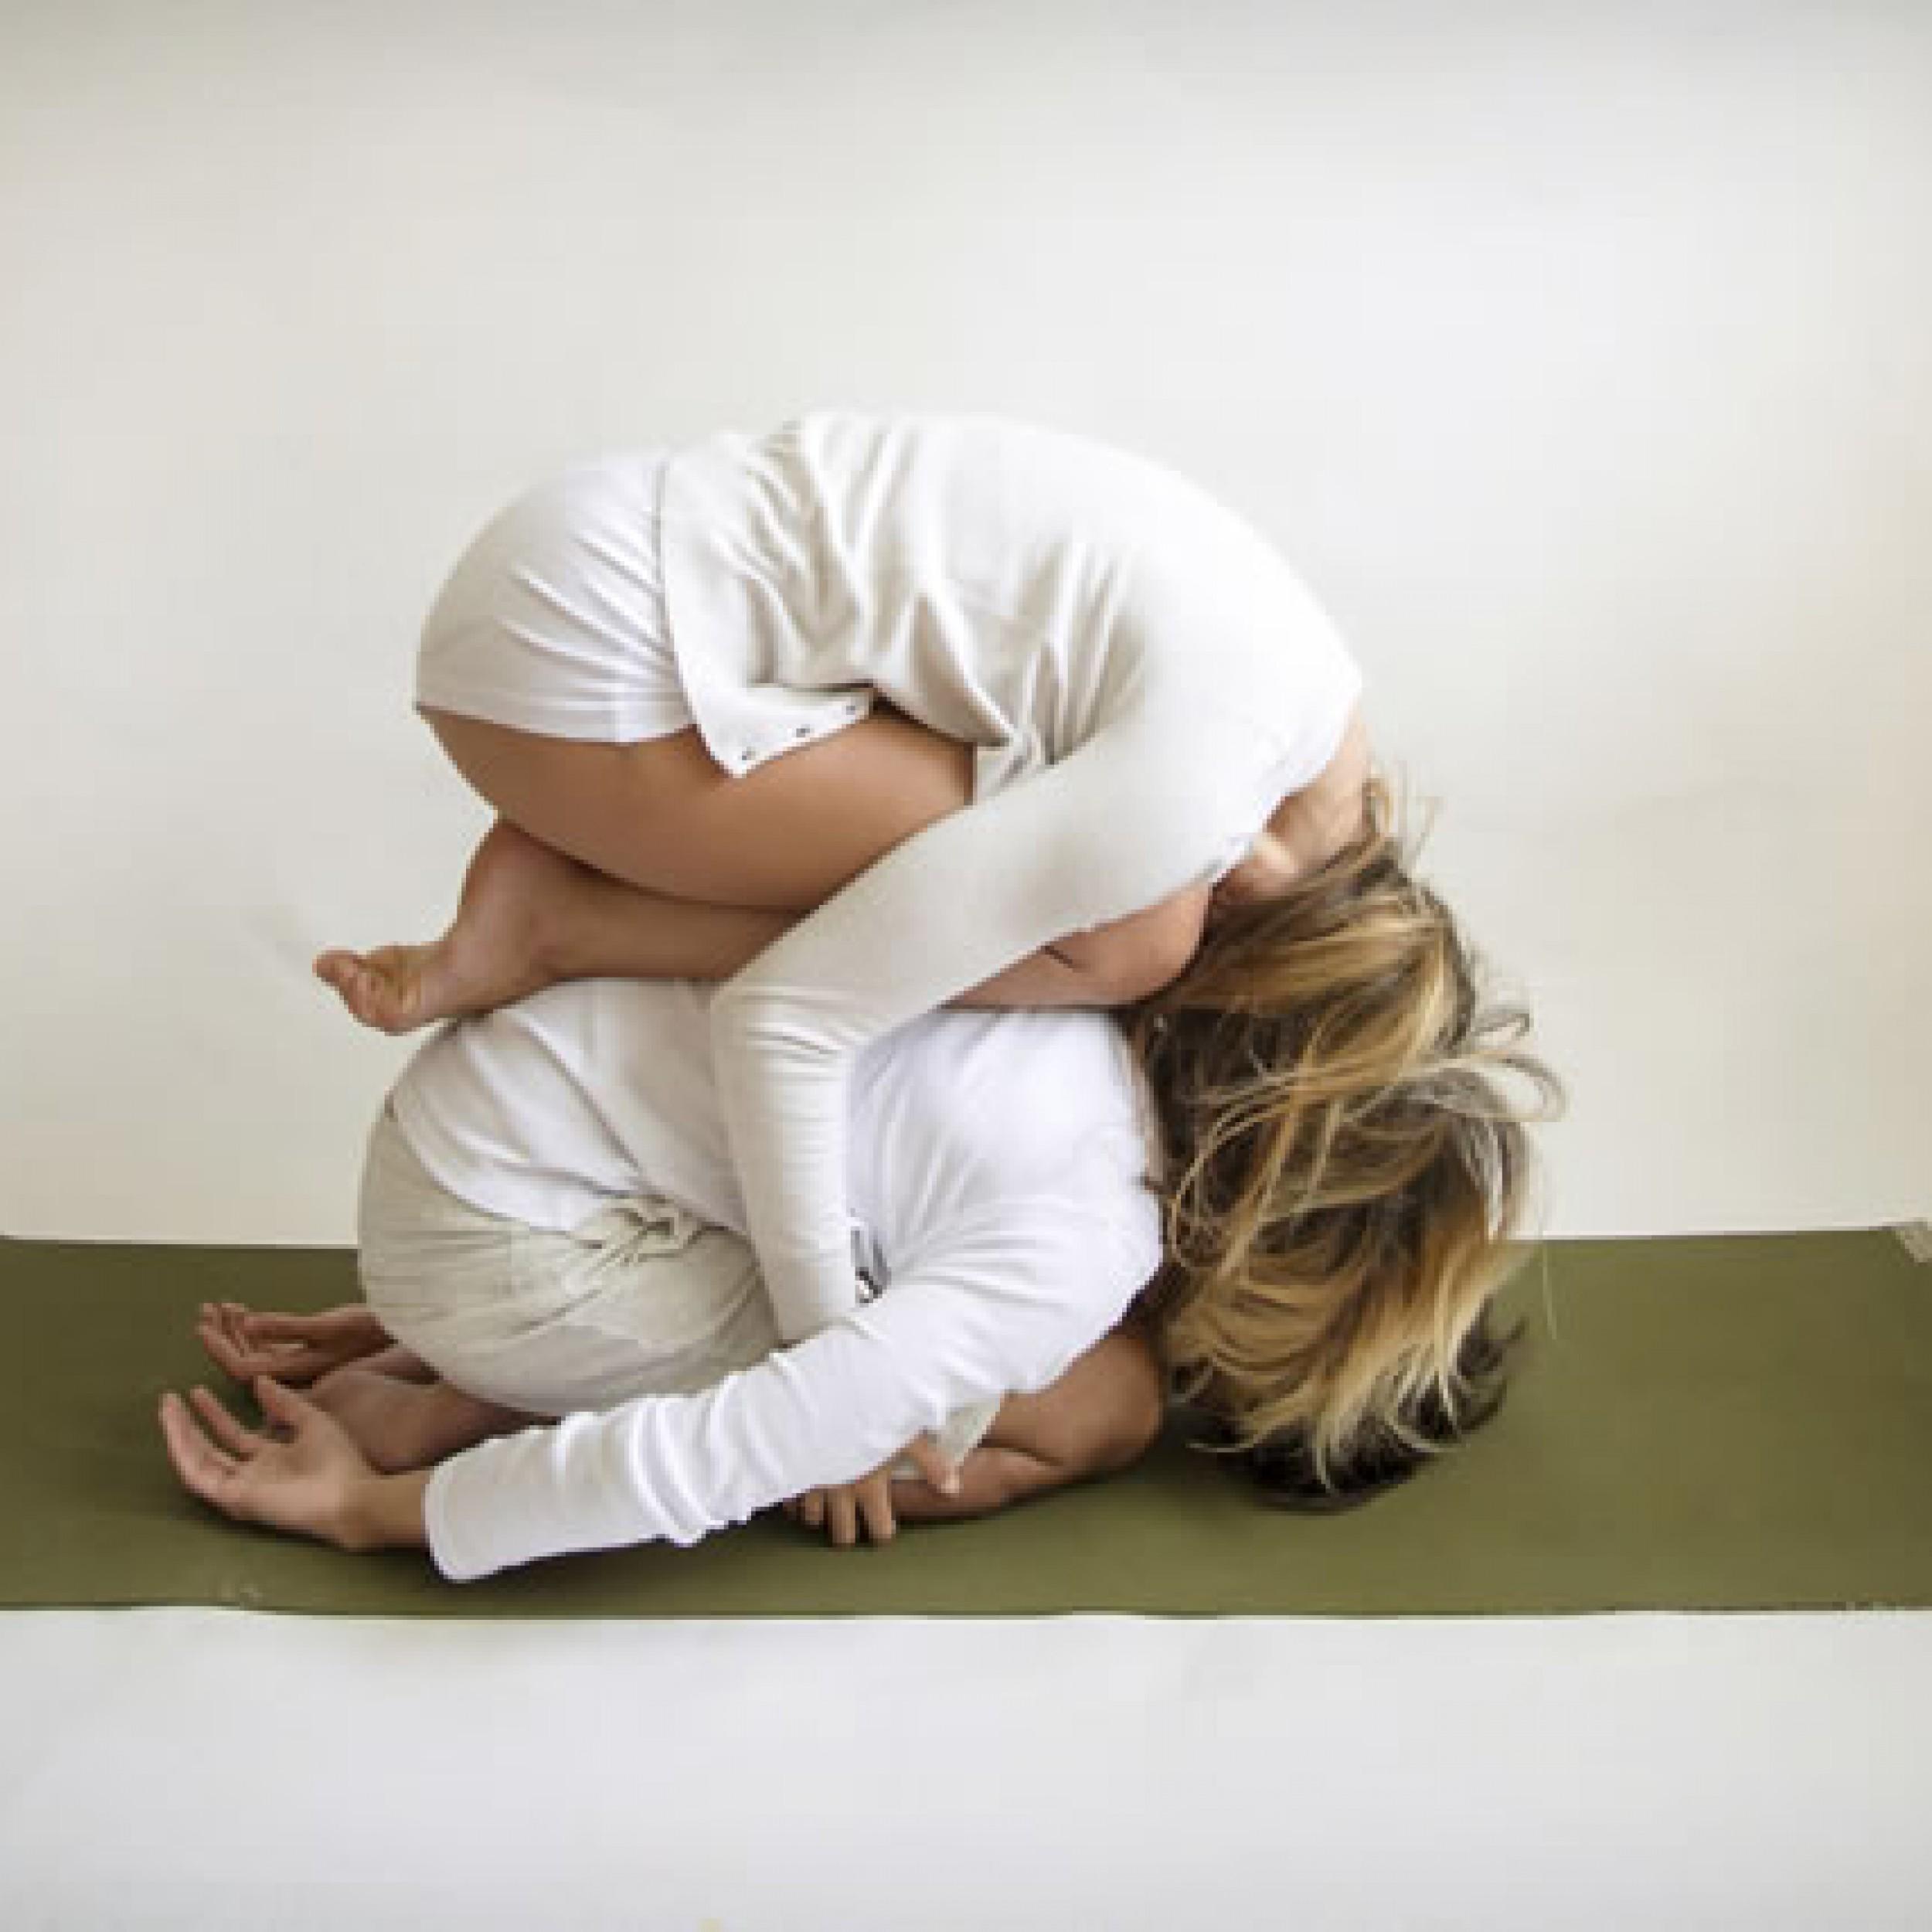 Duo Yoga